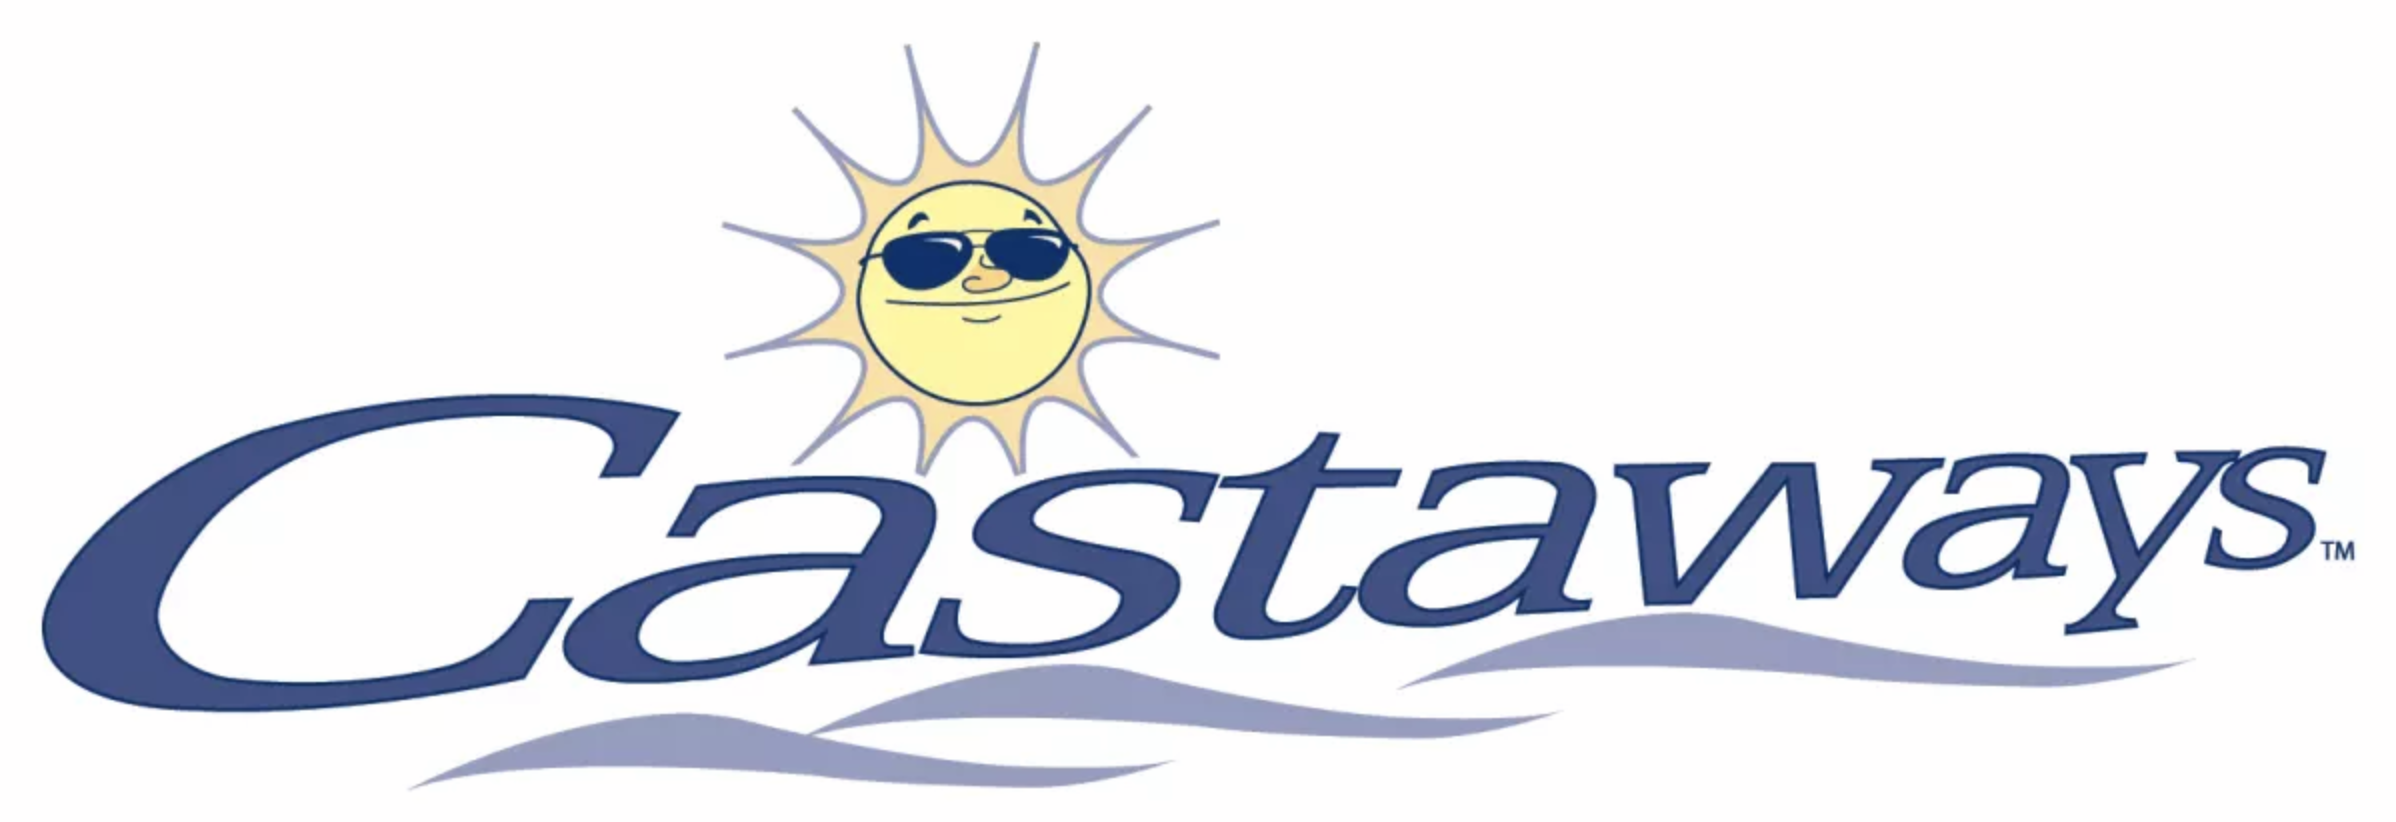 Castaways Logo.png